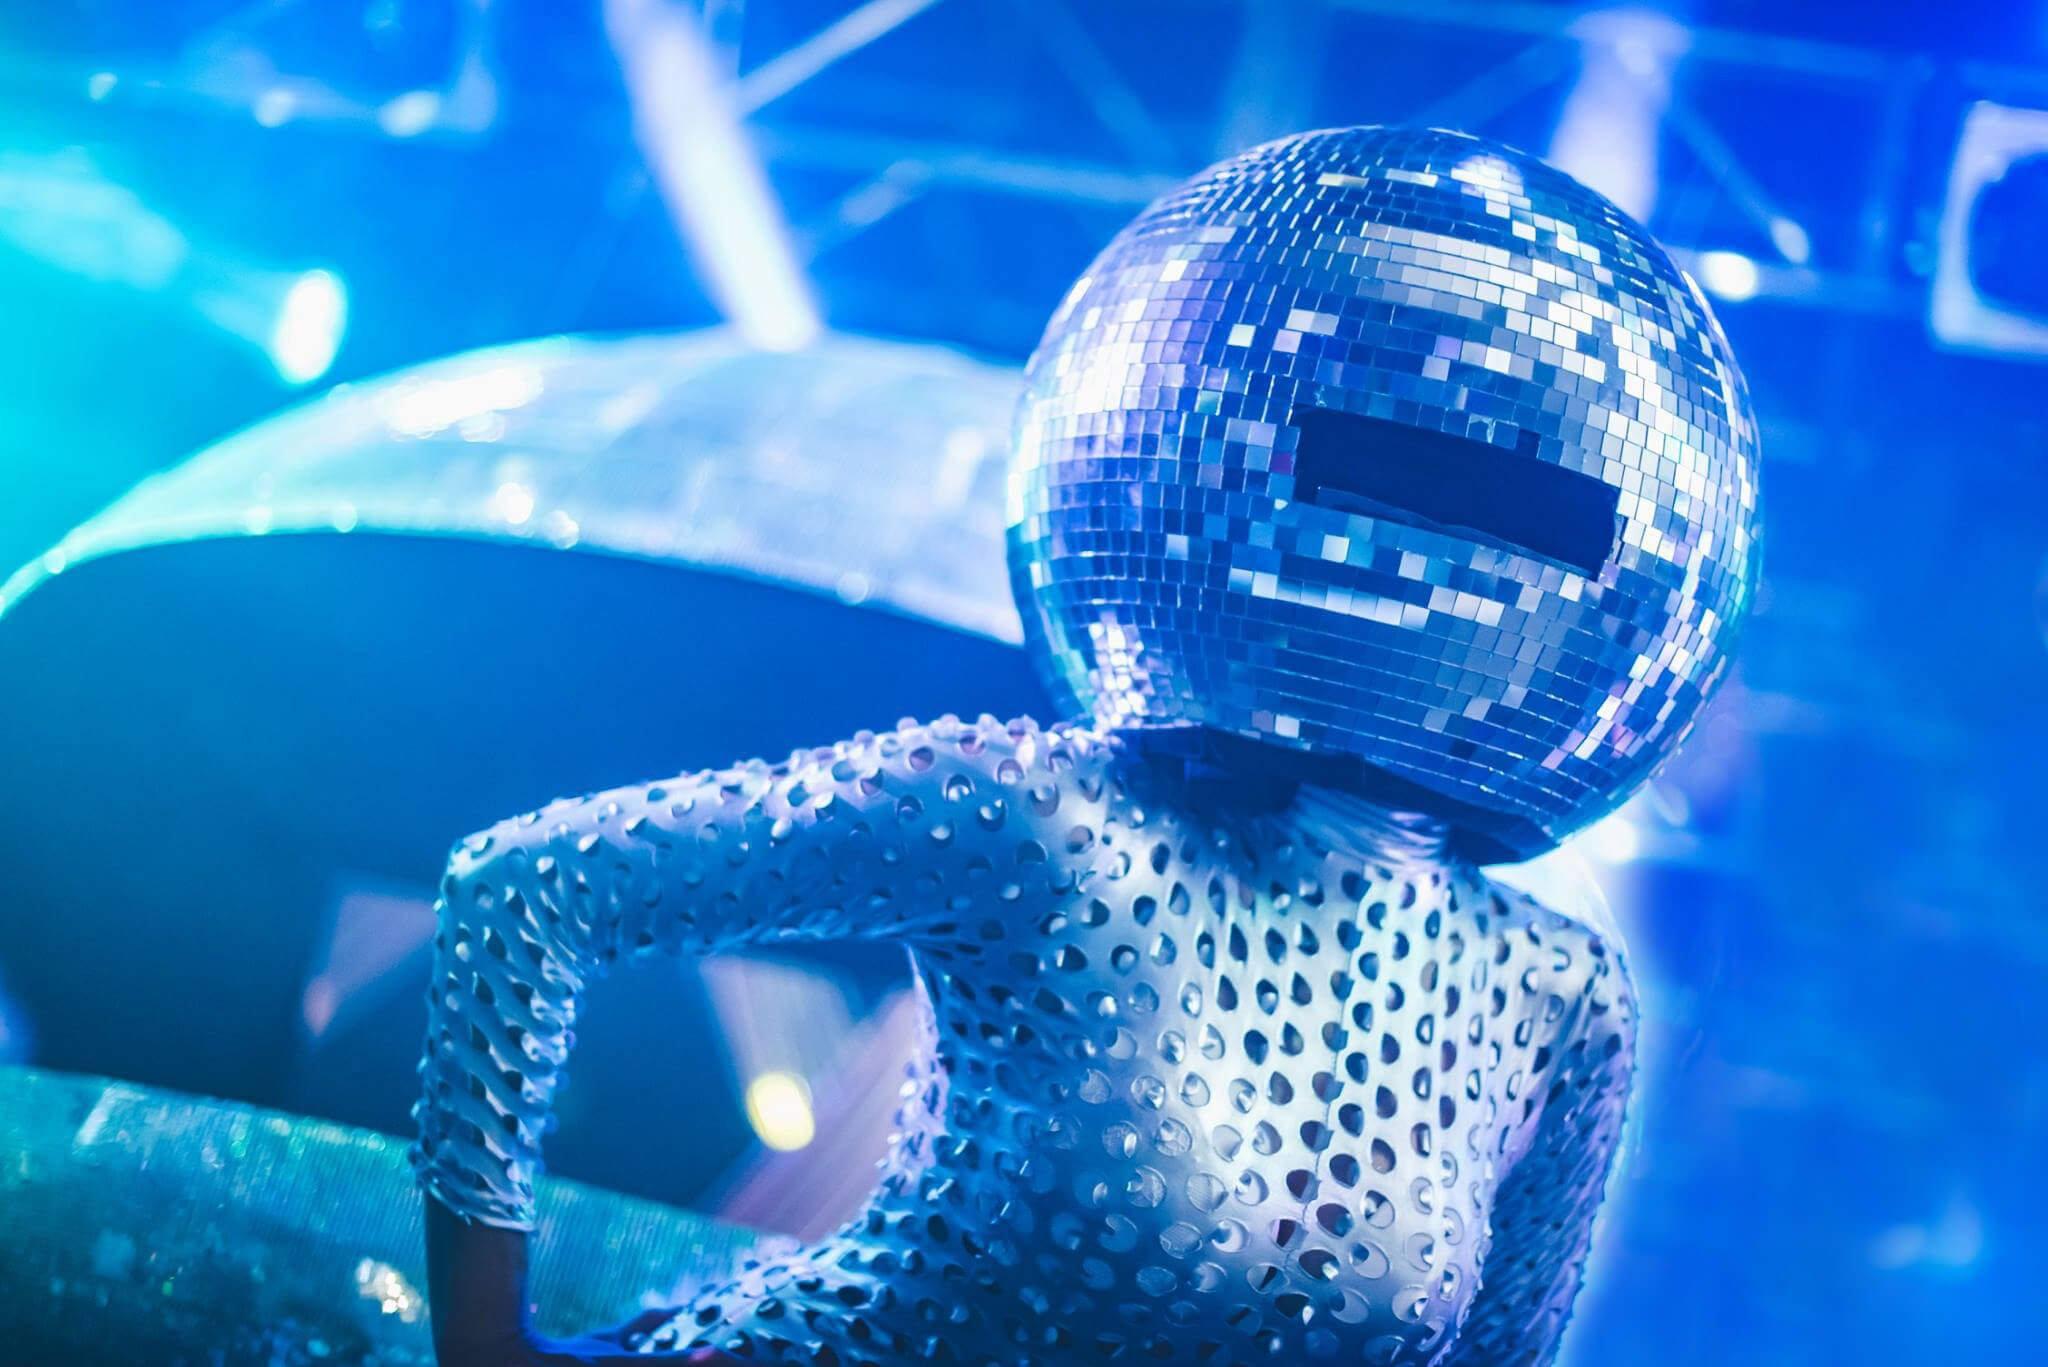 disco ball head for website